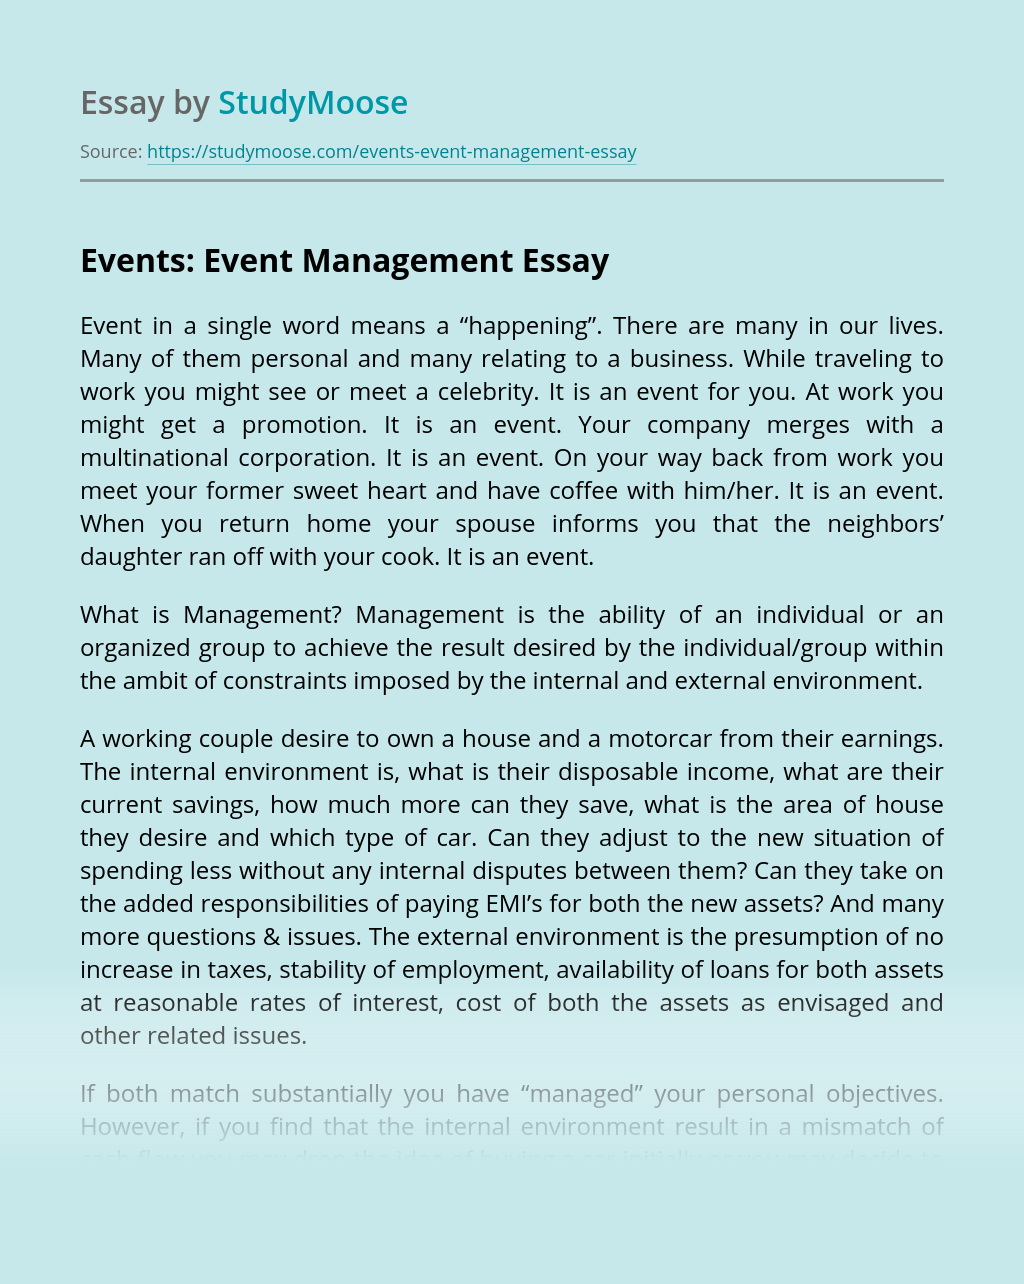 Events: Event Management